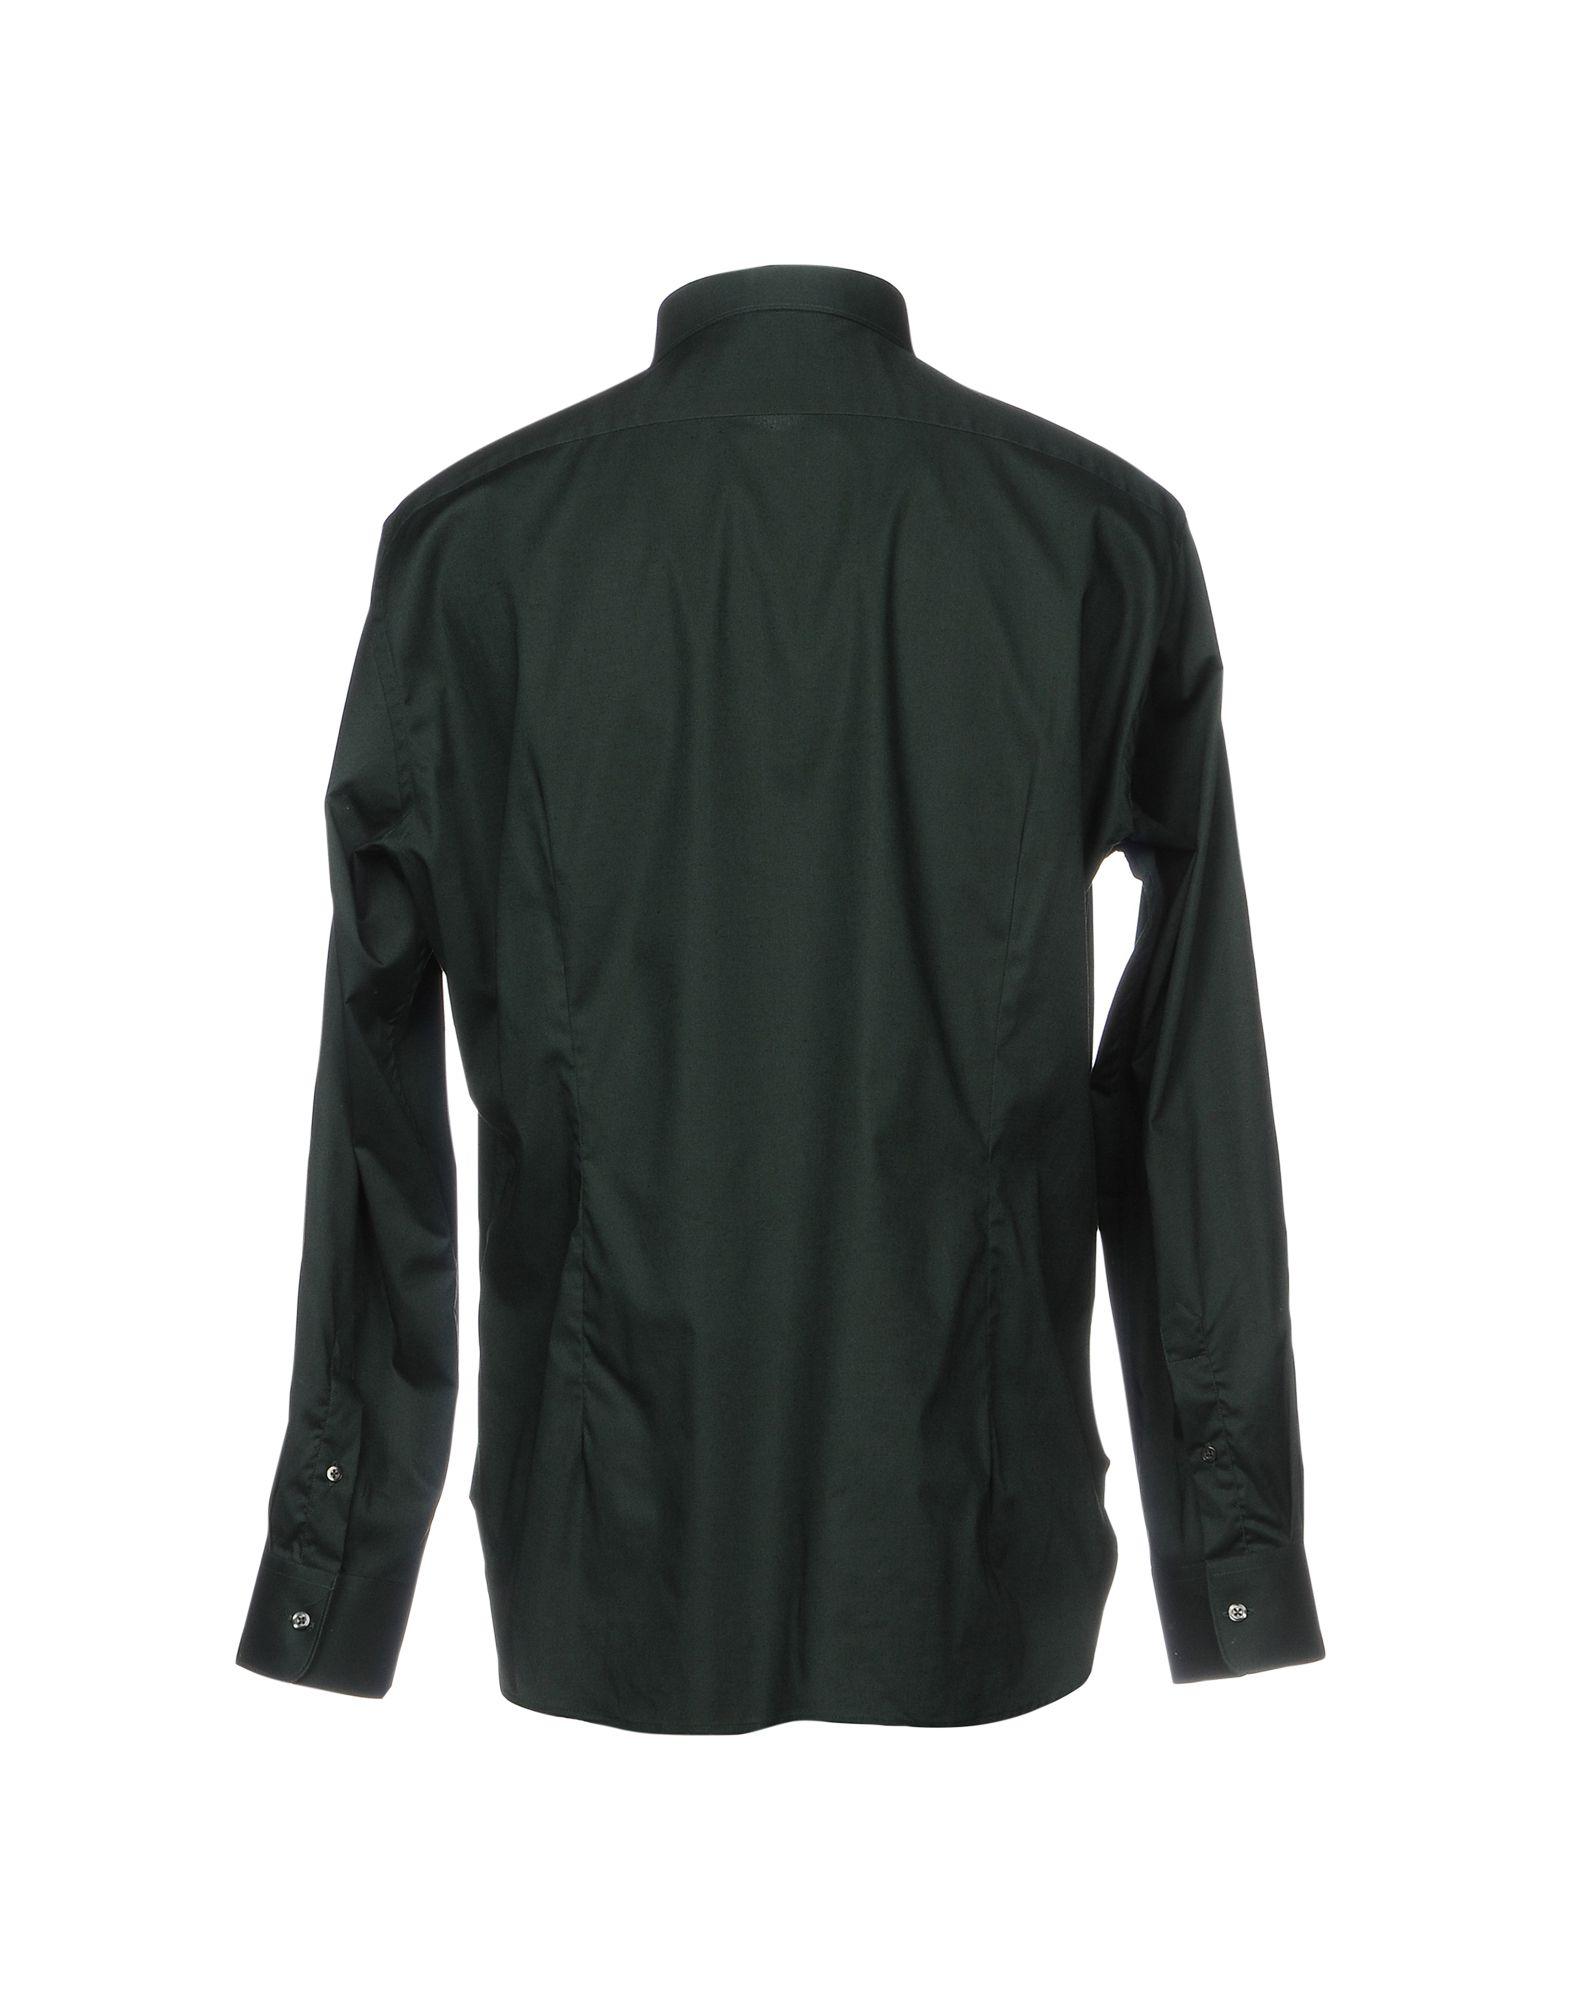 Camicia Tinta Unita Ingram Ingram Unita Uomo - 38693730SW a0c7c8